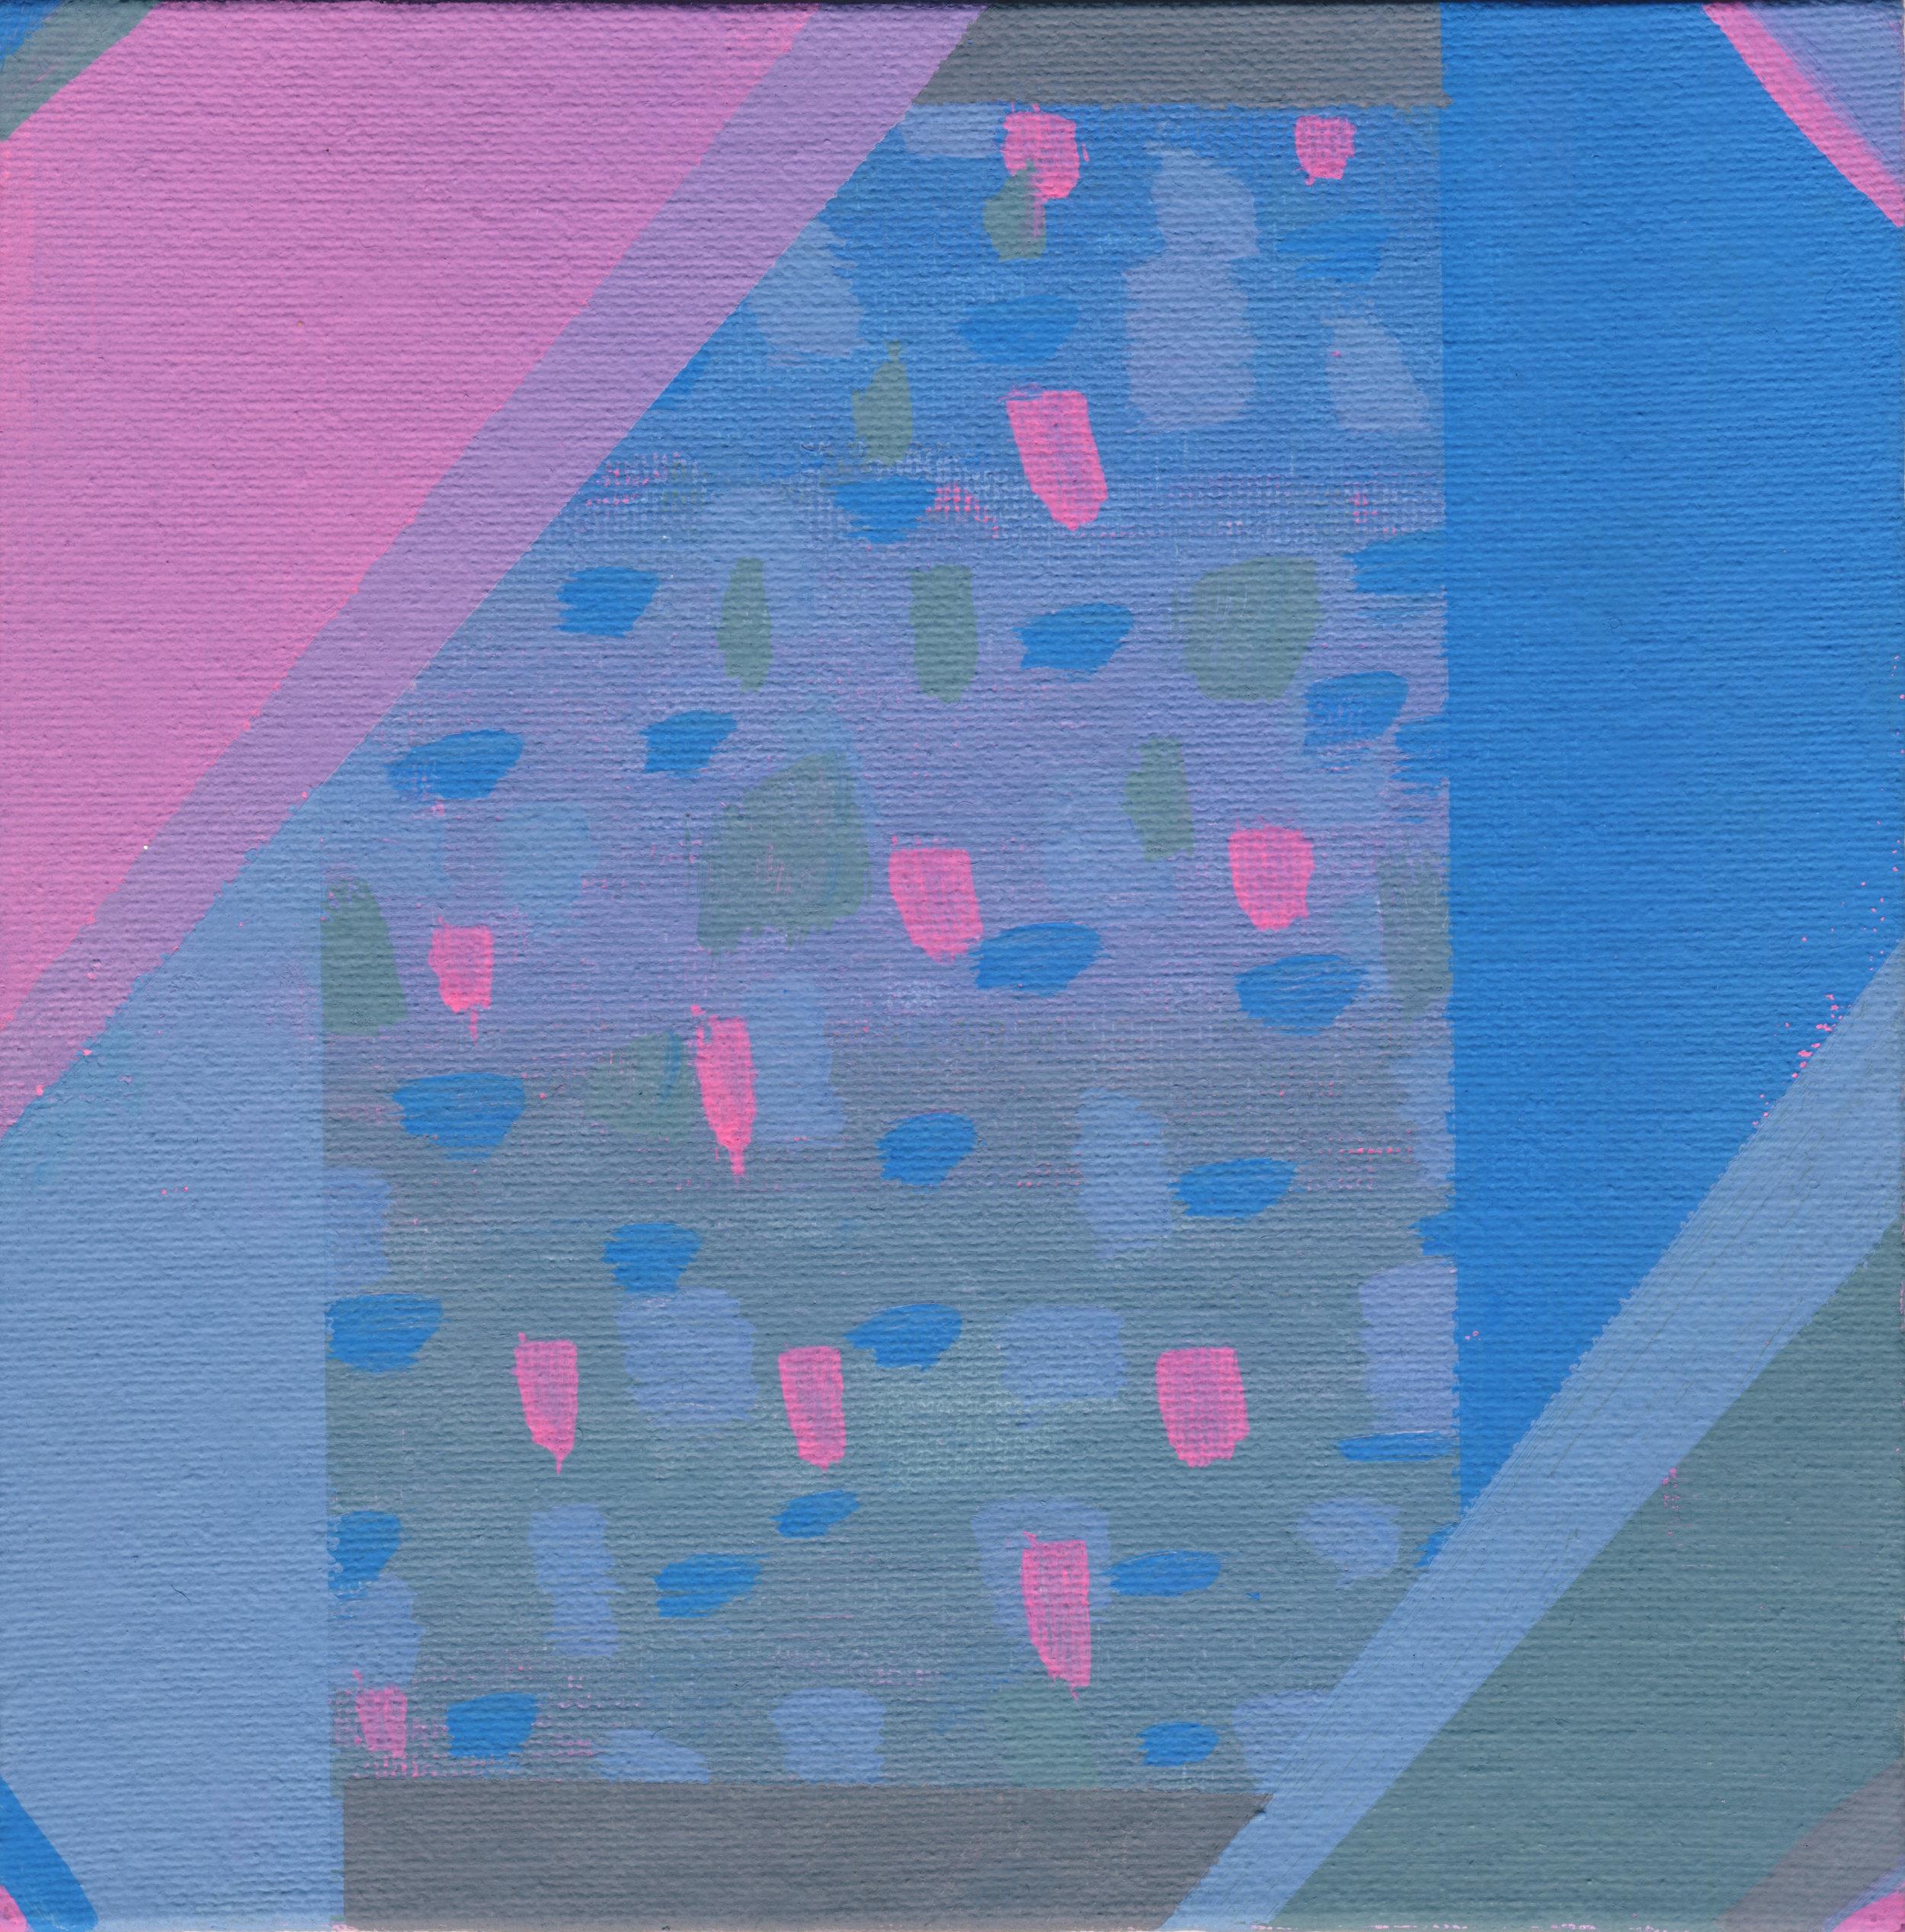 "4/100, Acrylic on canvas panel, 6"" X 6"", 1/10/19"